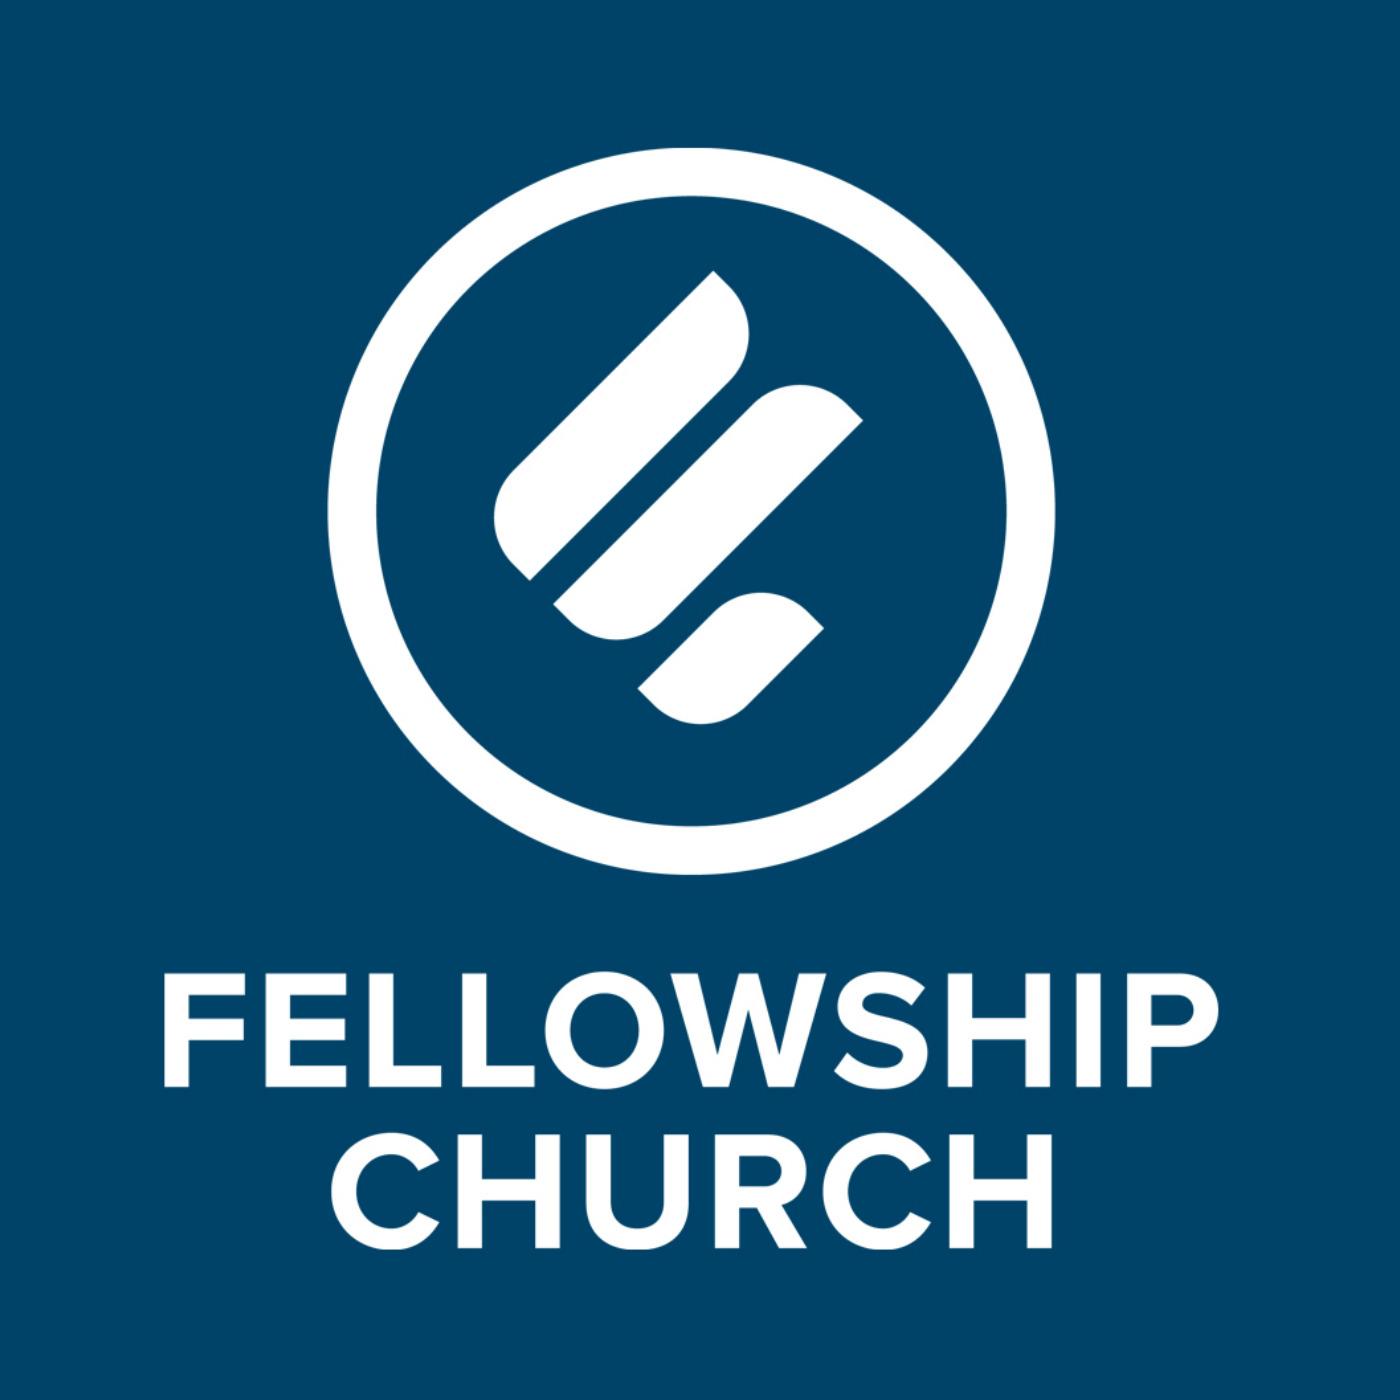 Fellowship Church - Oakland, IA